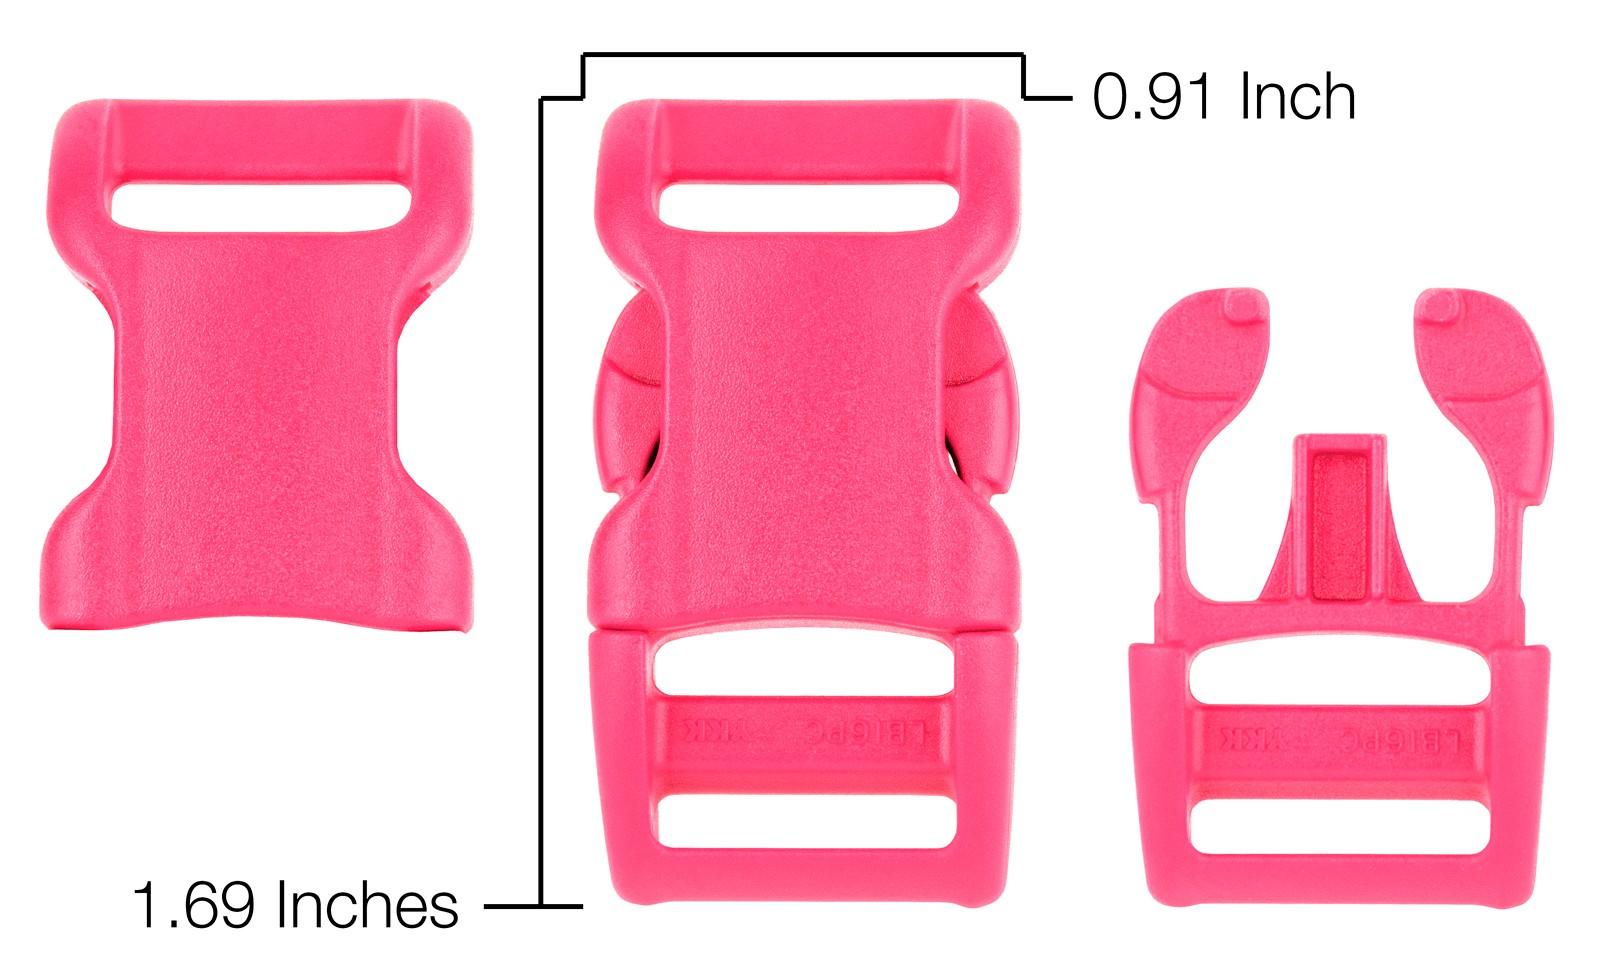 25-1 Inch Pink Contoured Side Release Plastic Buckles YKK